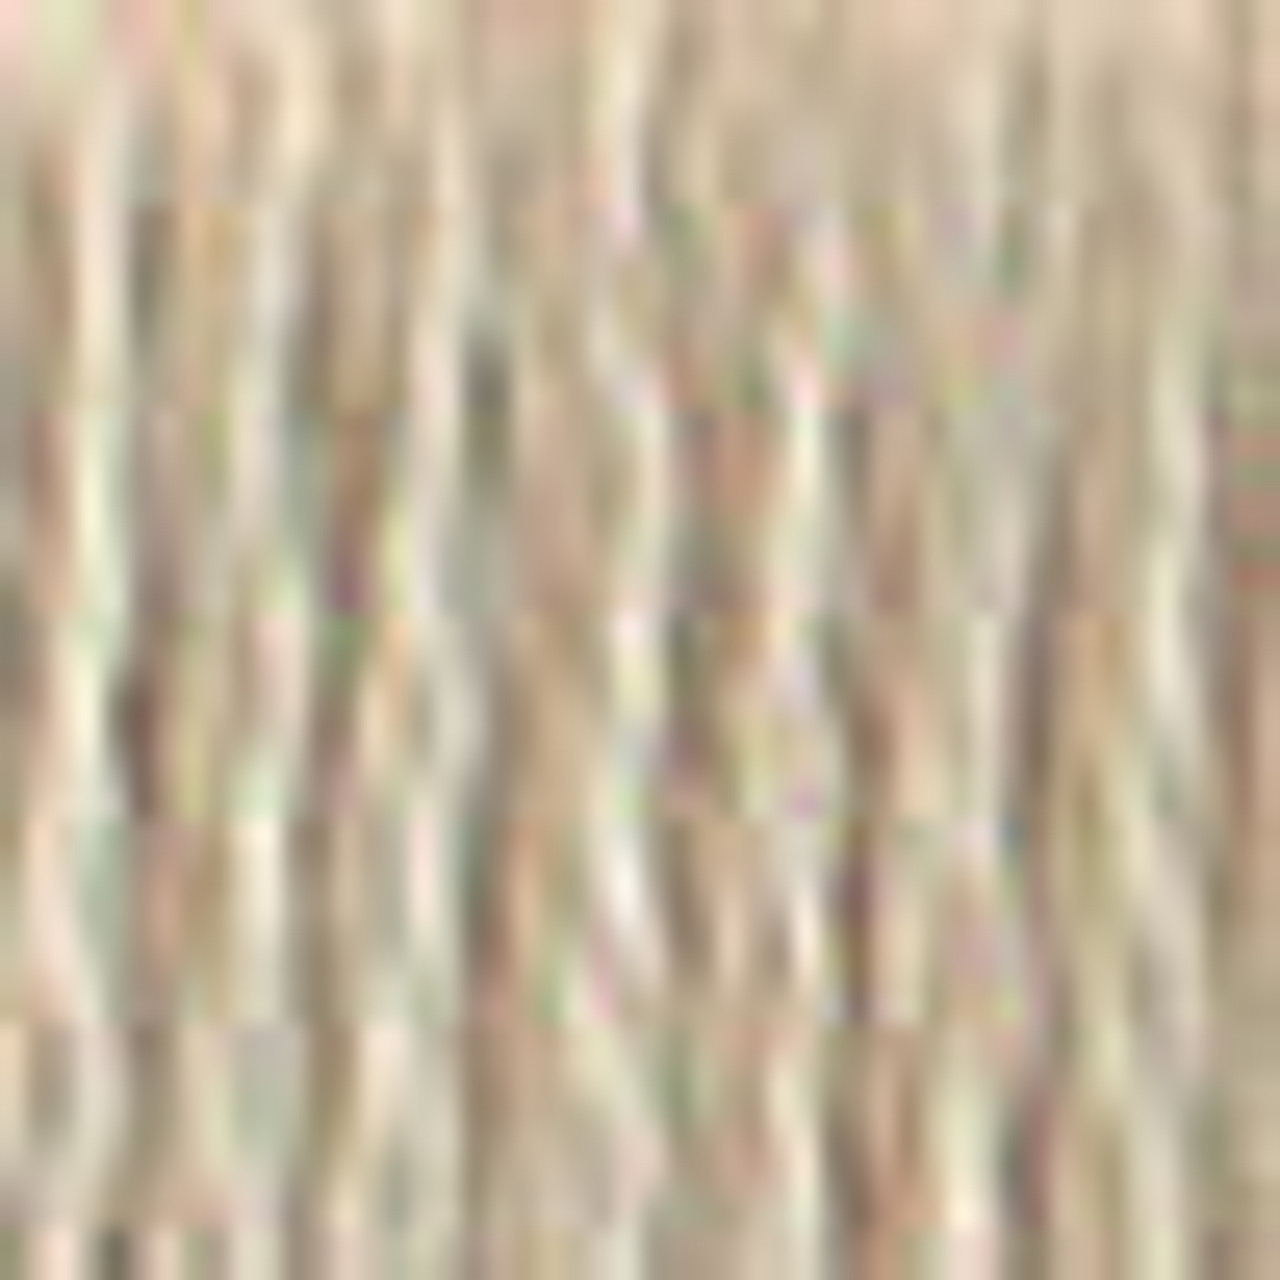 DMC # 3033 Very Light Mocha Brown Floss / Thread